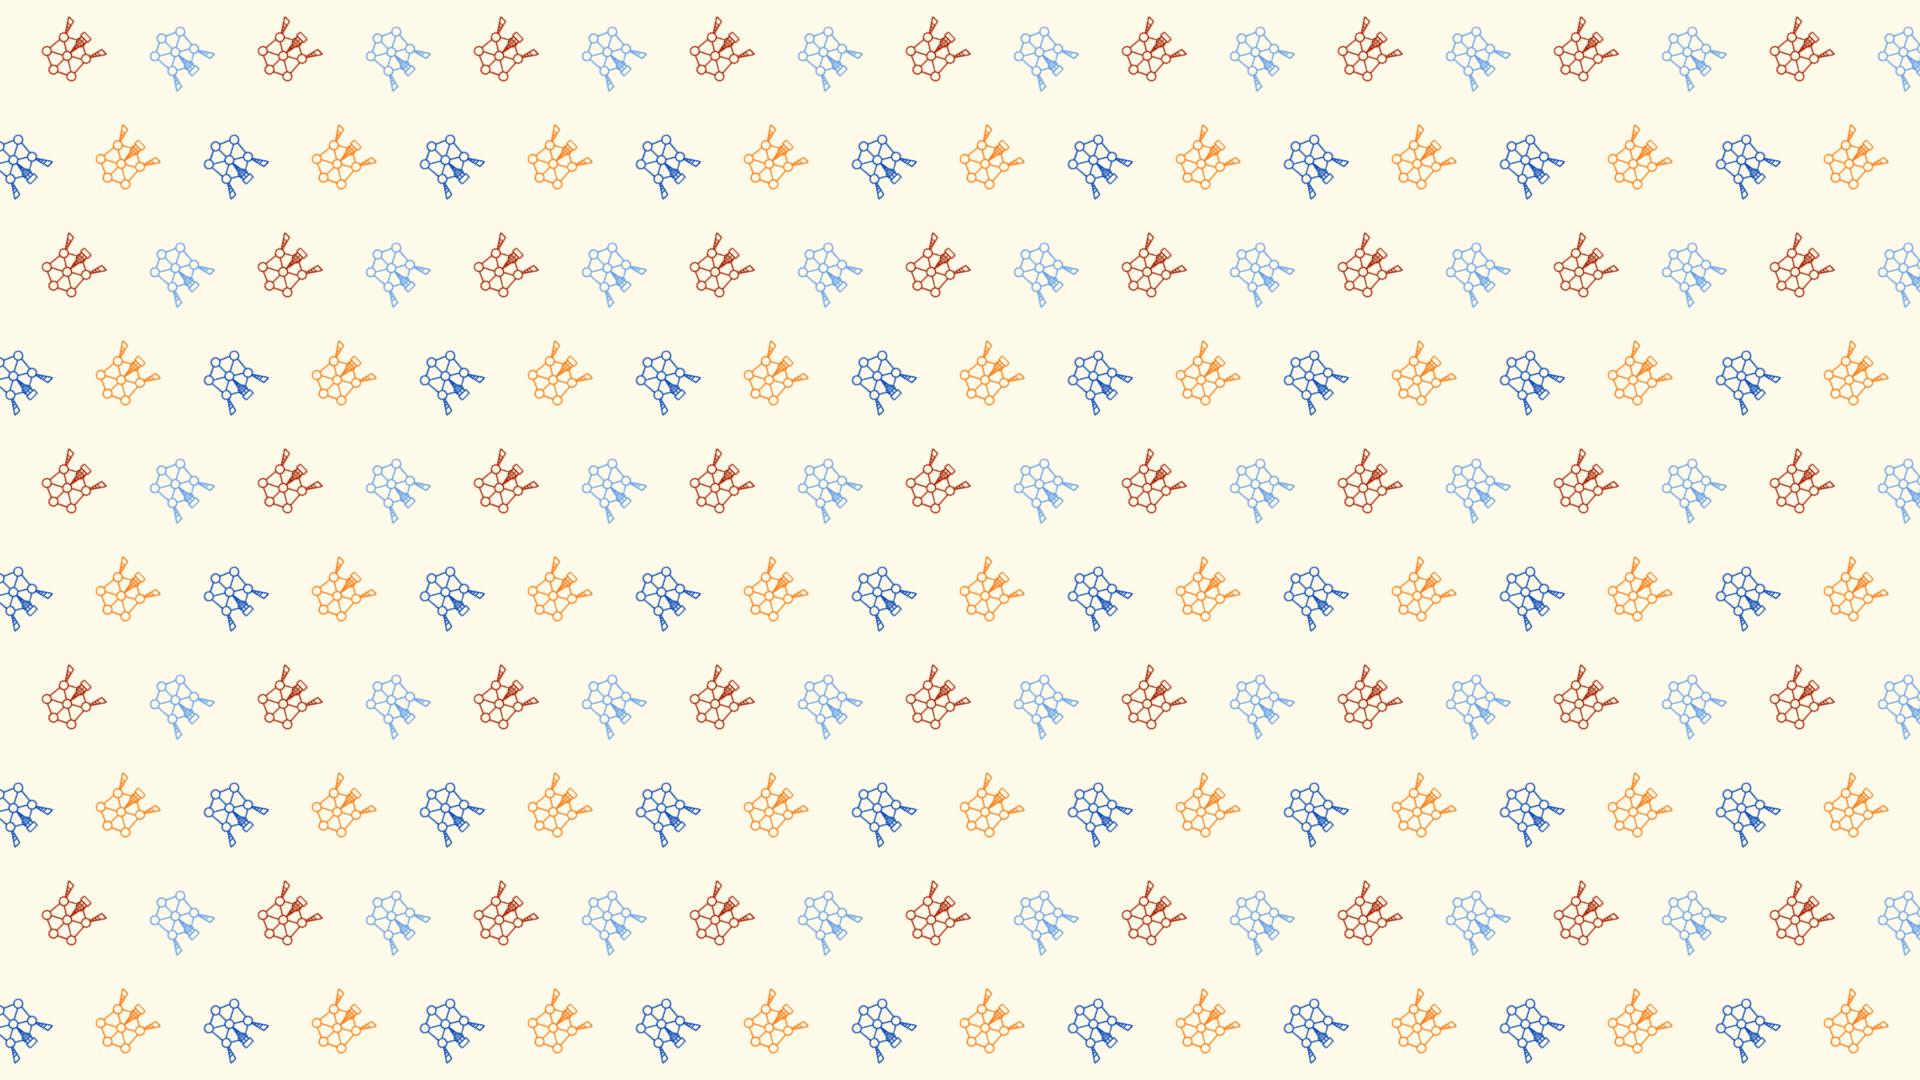 Blue,                Pattern,                Line,                Design,                Textile,                Product,                Wallpaper,                Monuments,                Belgium,                Atom,                Brussels,                IconPattern,                HDPatternBackground,                 Free Image